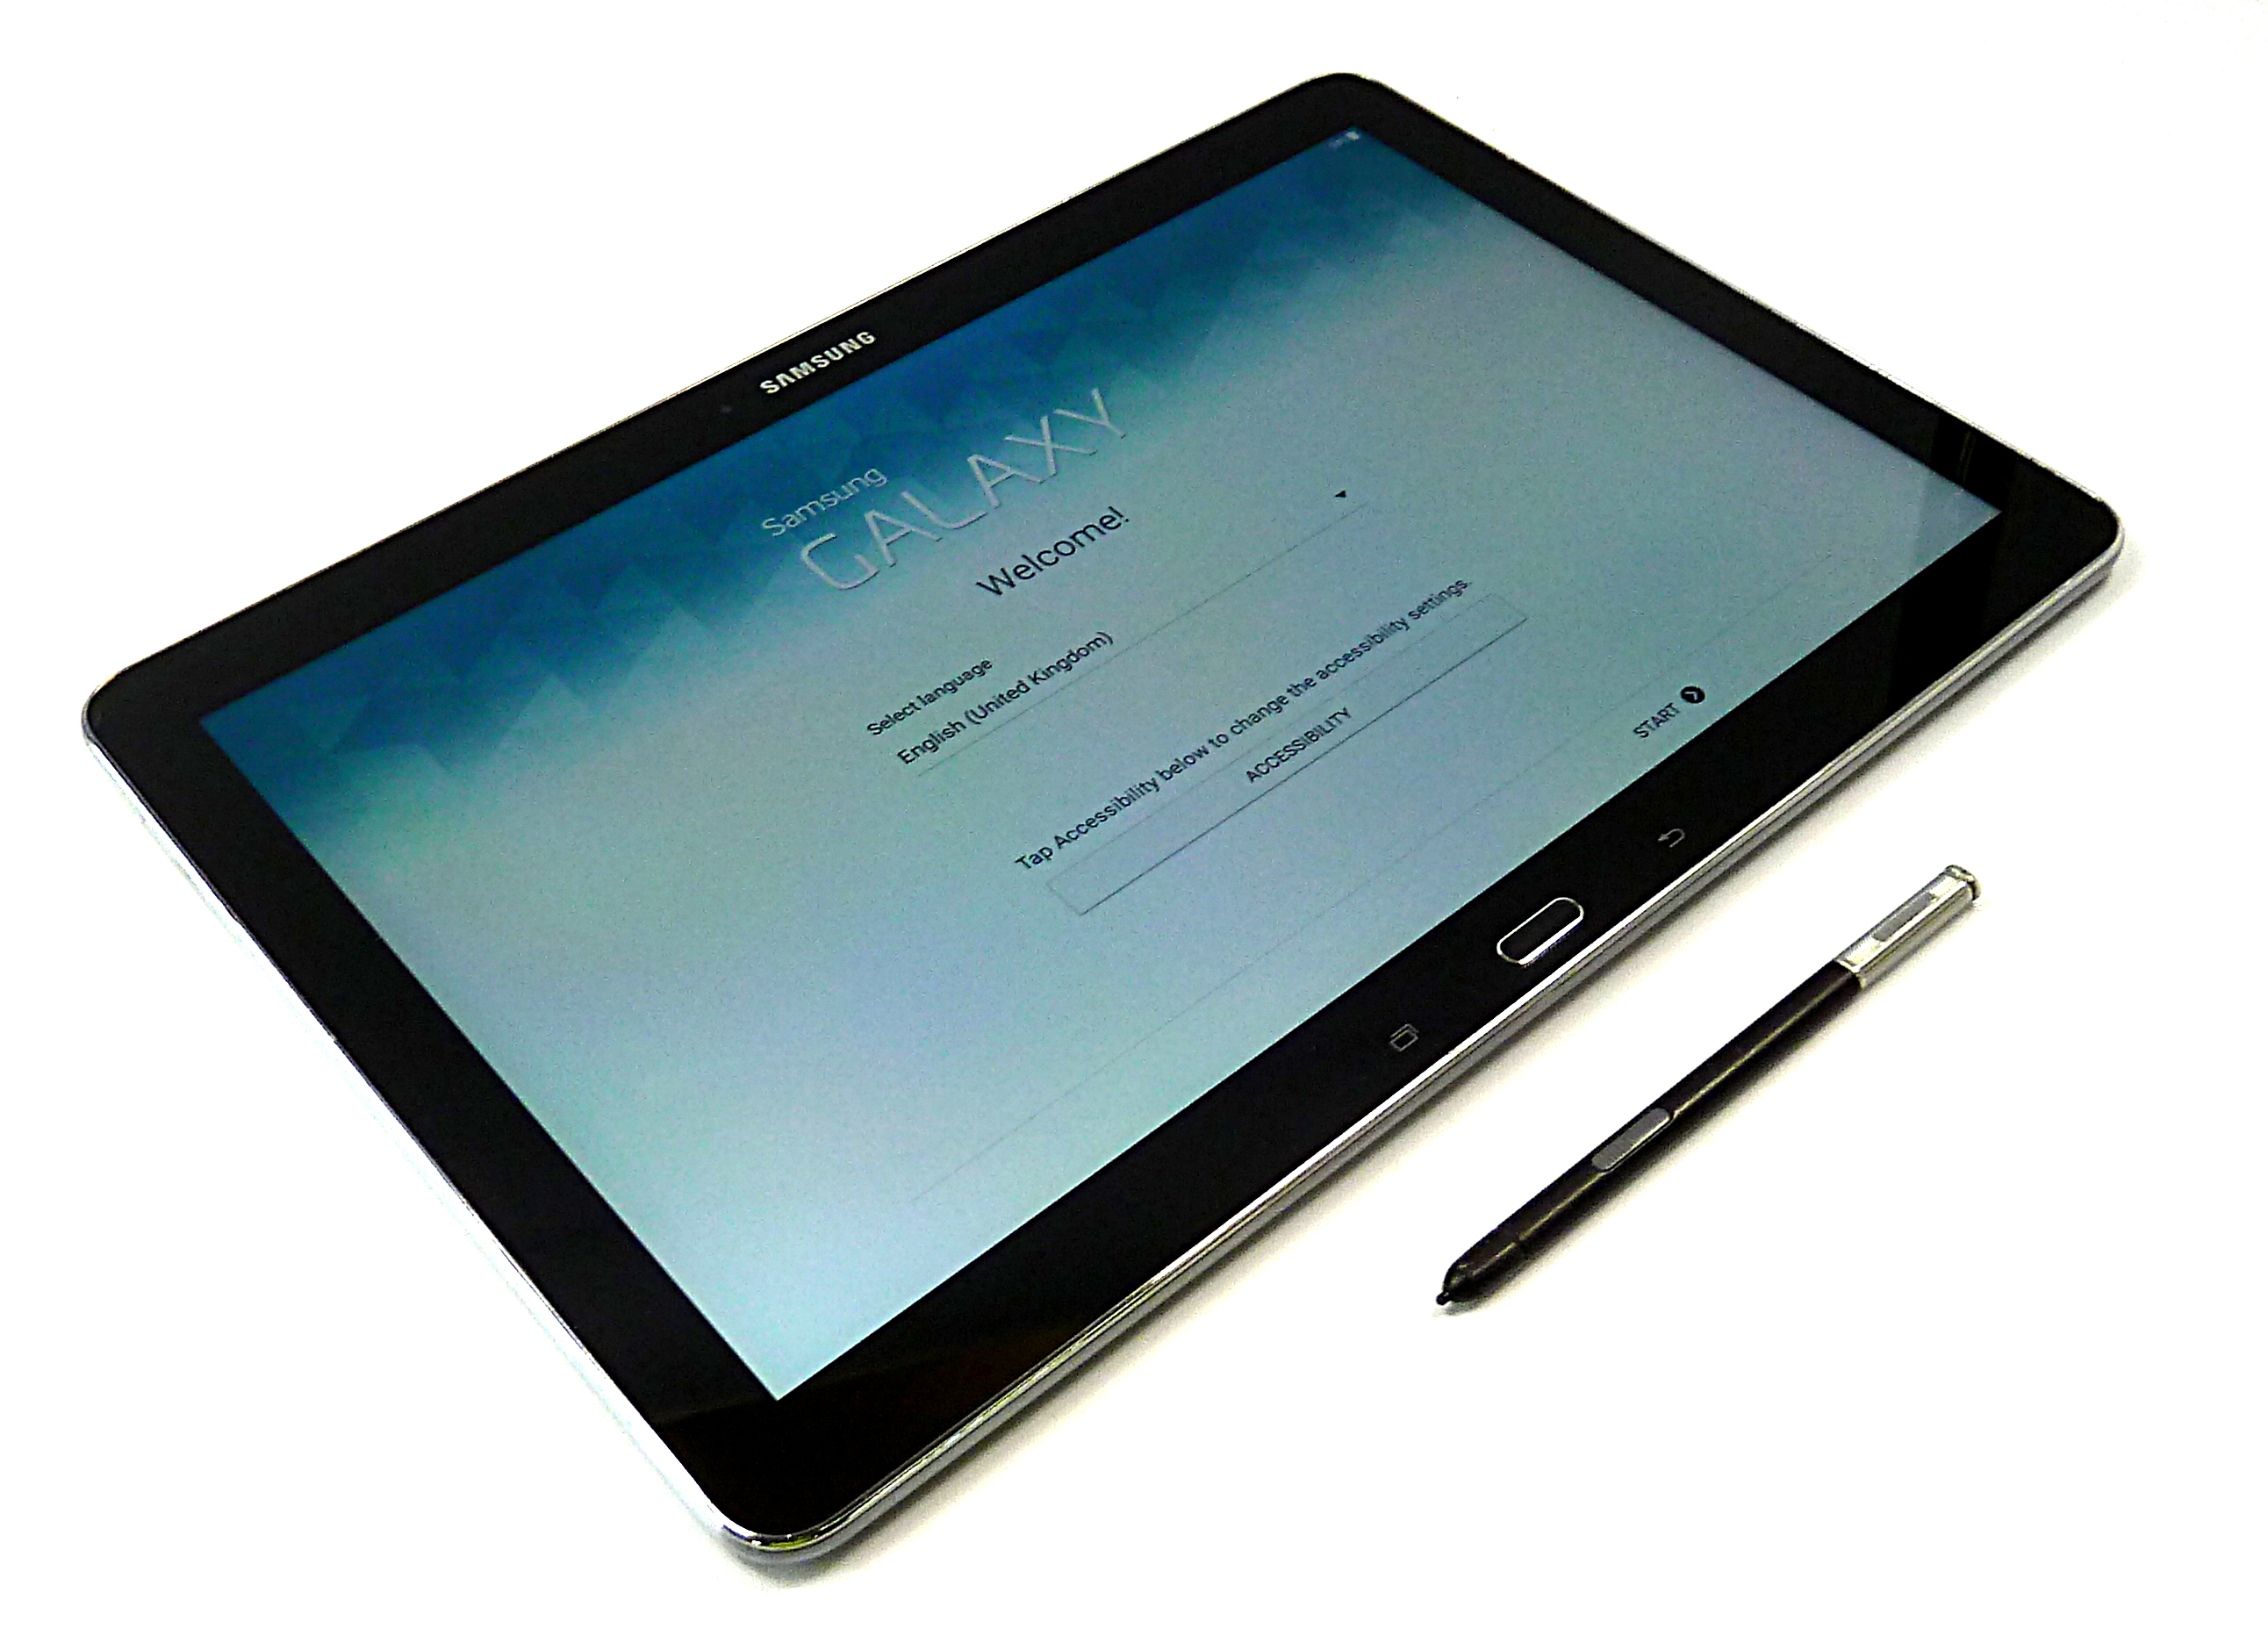 Samsung Galaxy Note Pro 12.2 SM-P900 - 32GB / Black / Grade B